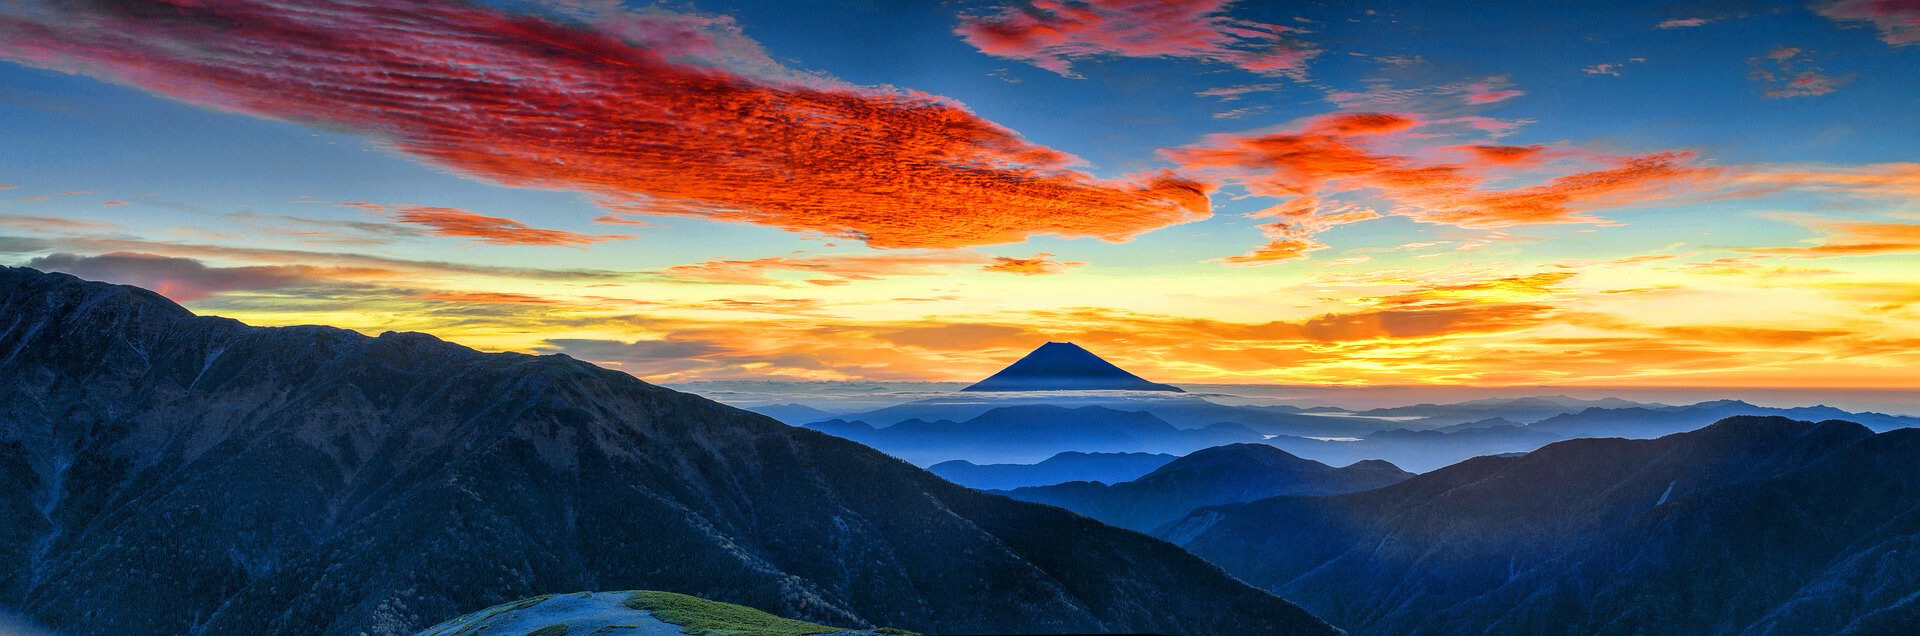 Bücher Vulkane Roter Himmel